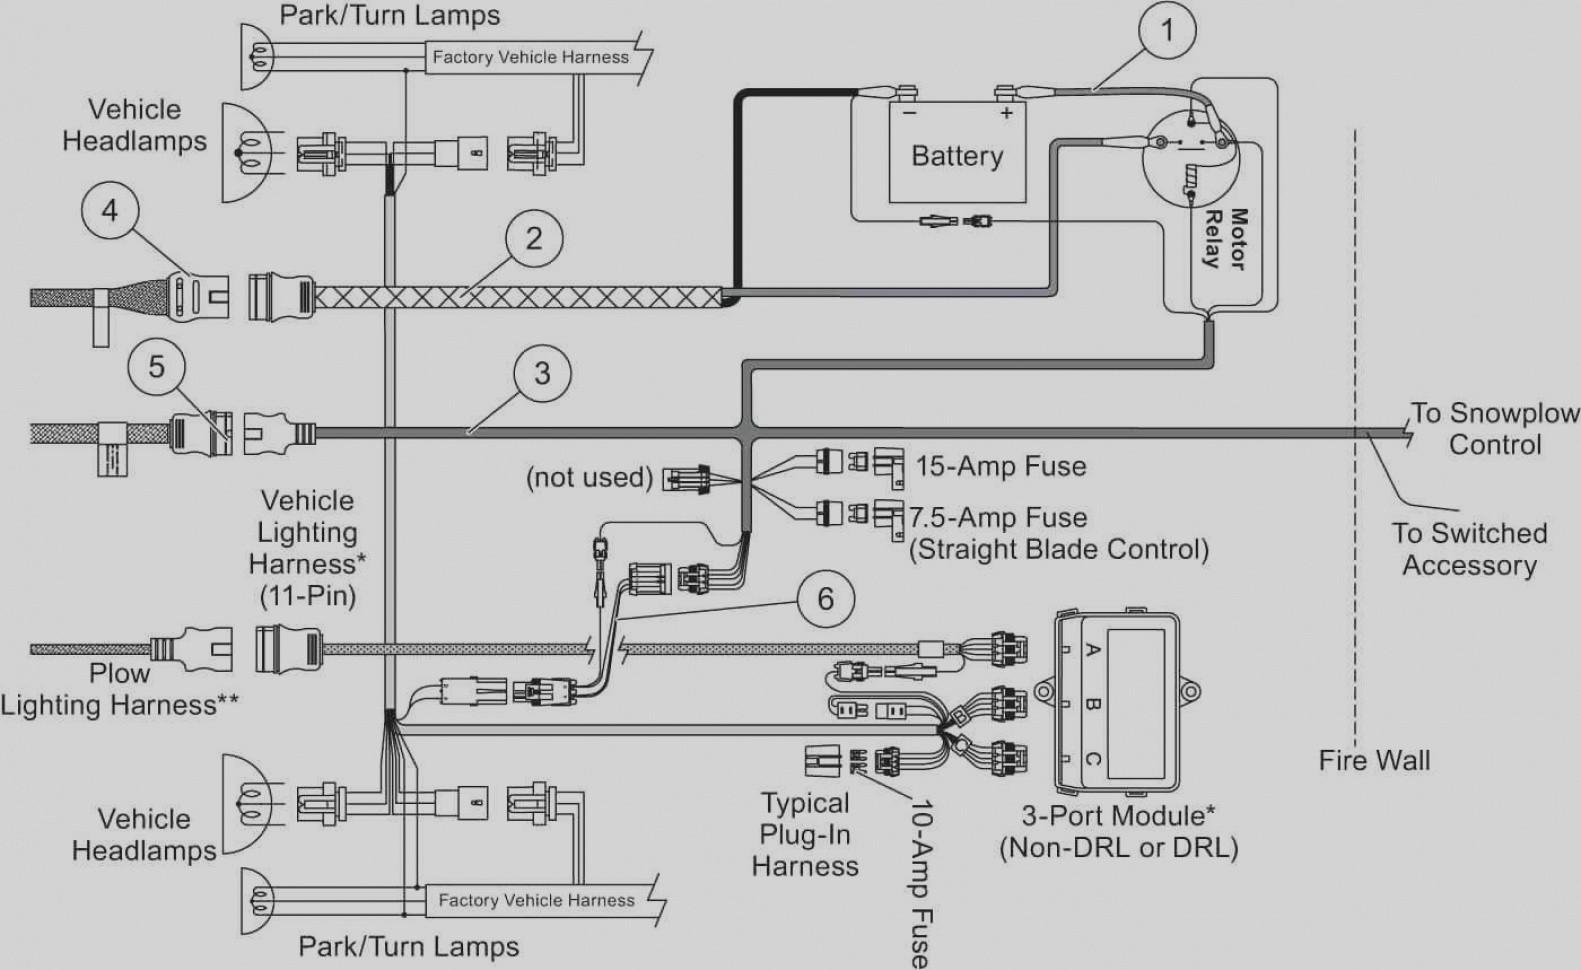 Elegant Meyer Snow Plow Wiring Diagram Boss Harness Parts Diagrams Schematics